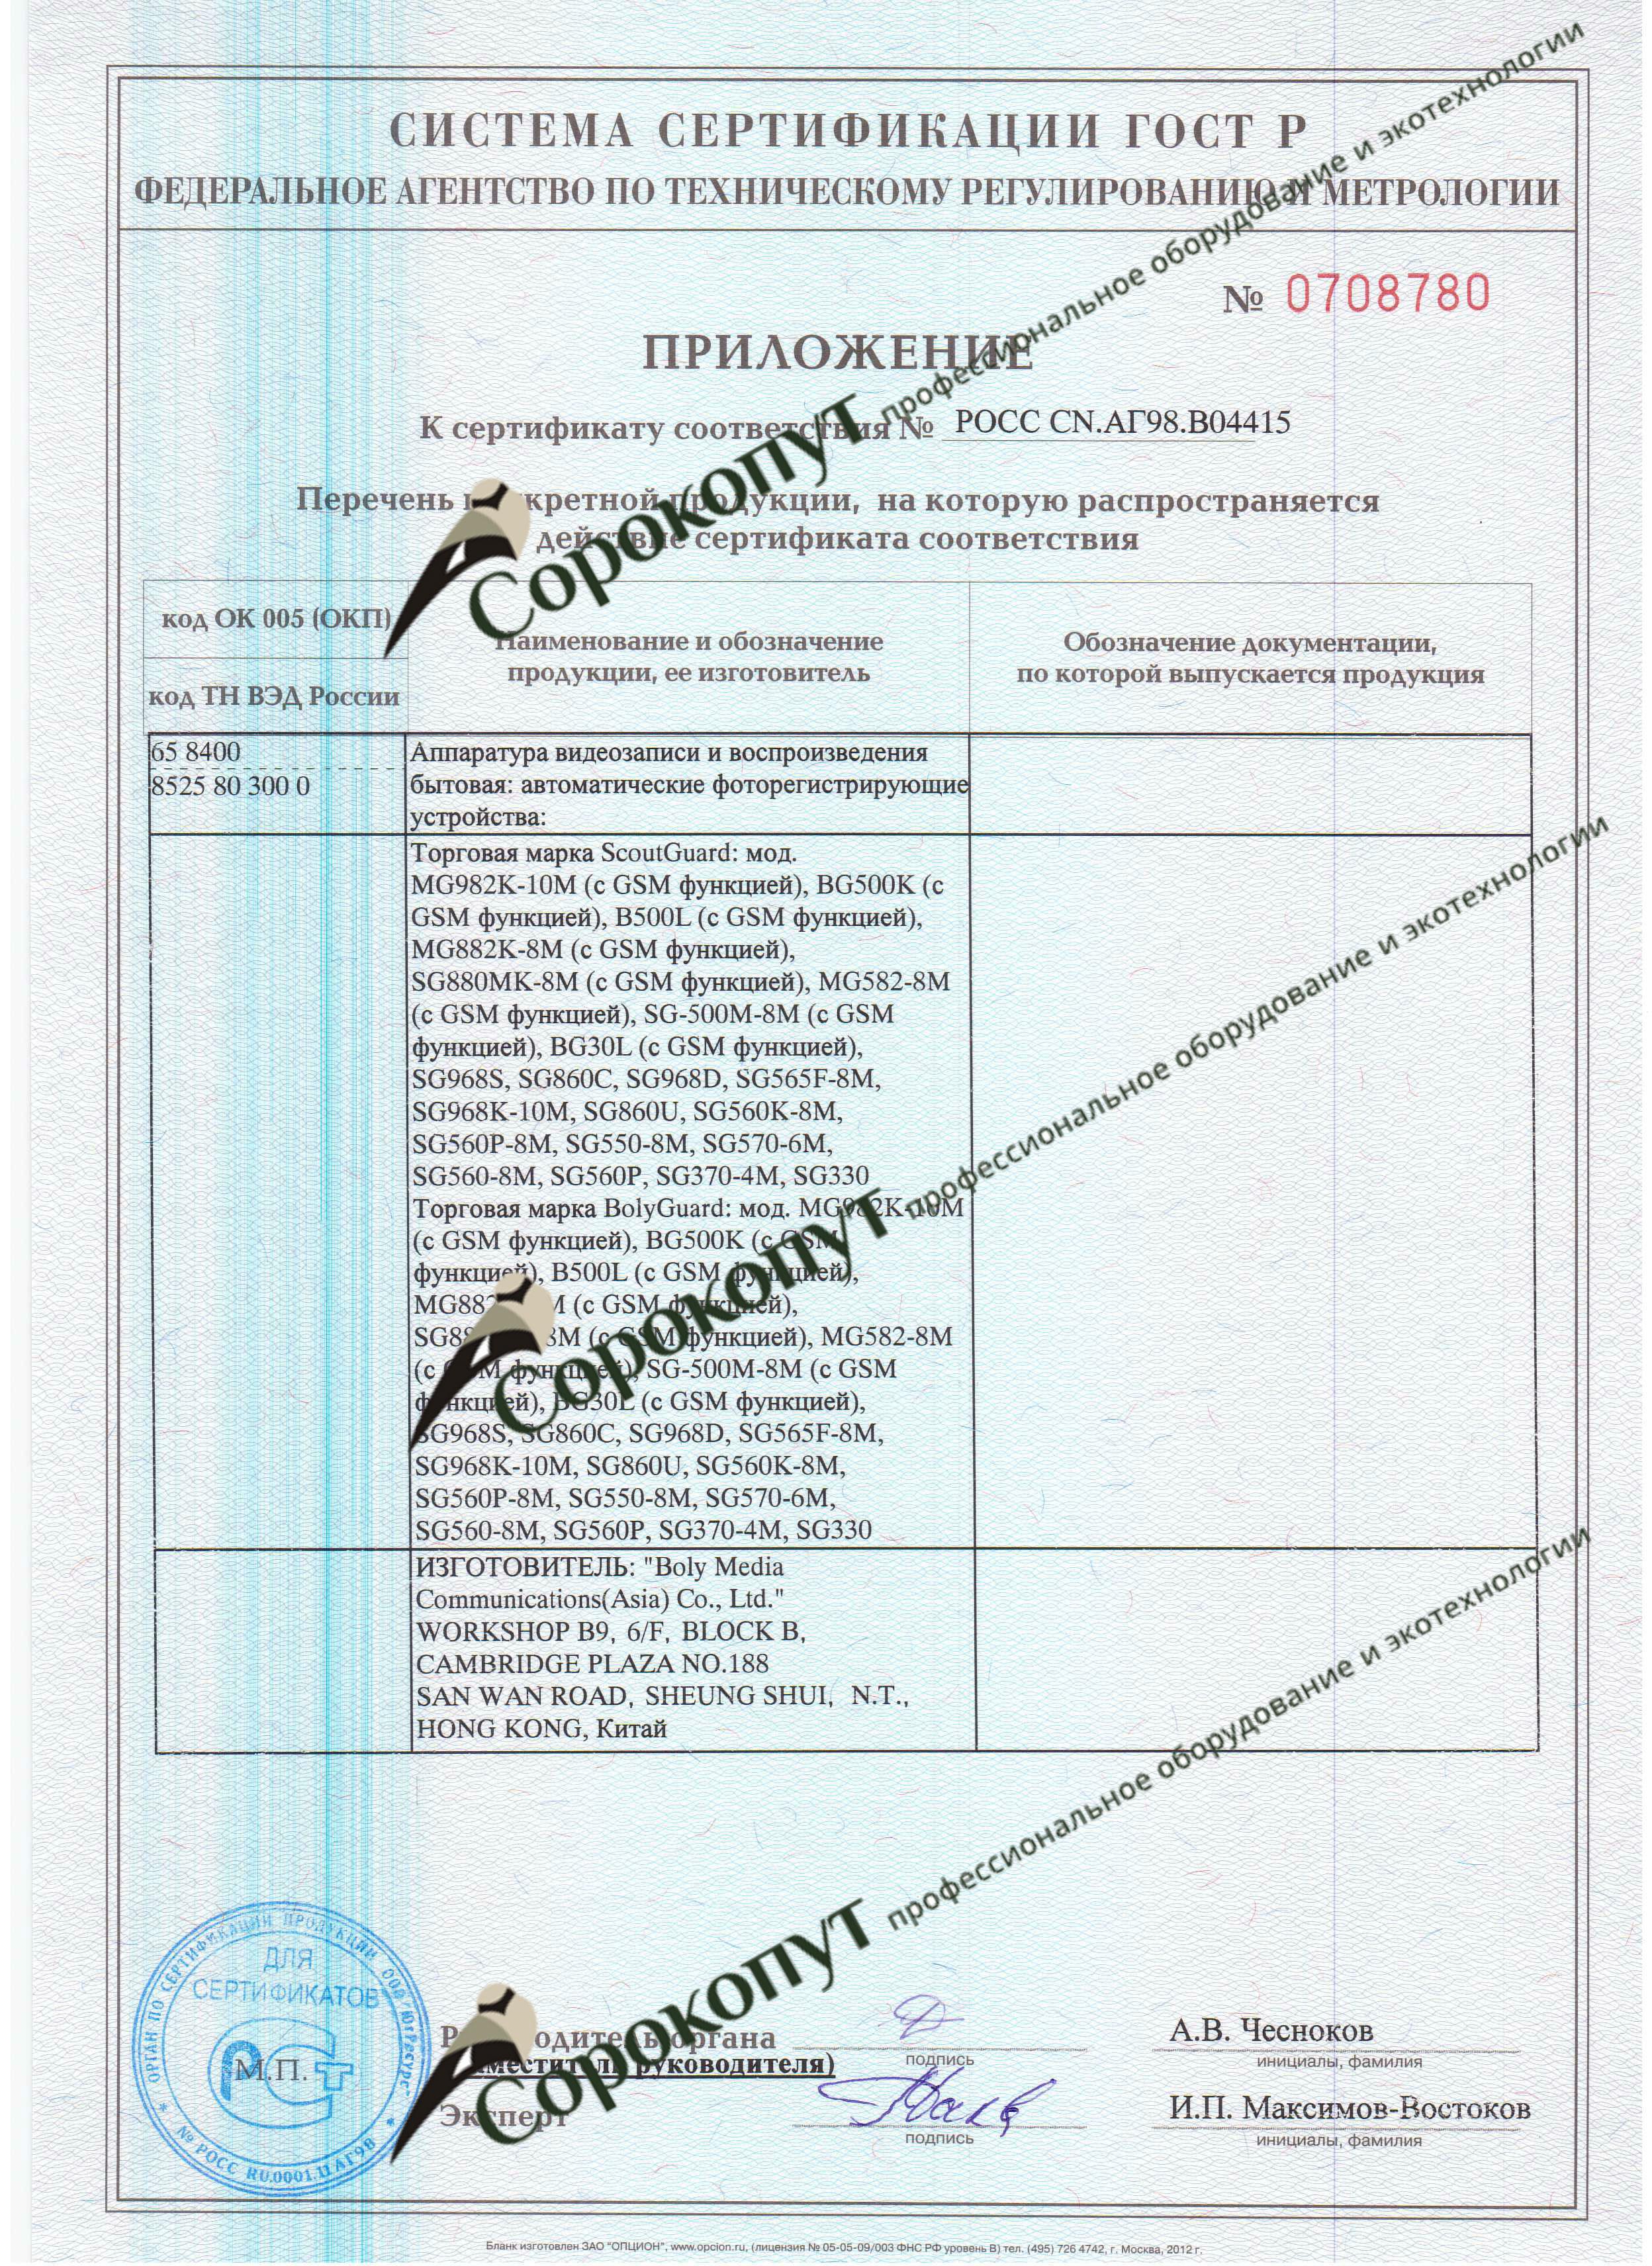 Сертификат фотоловушки Bolymedia